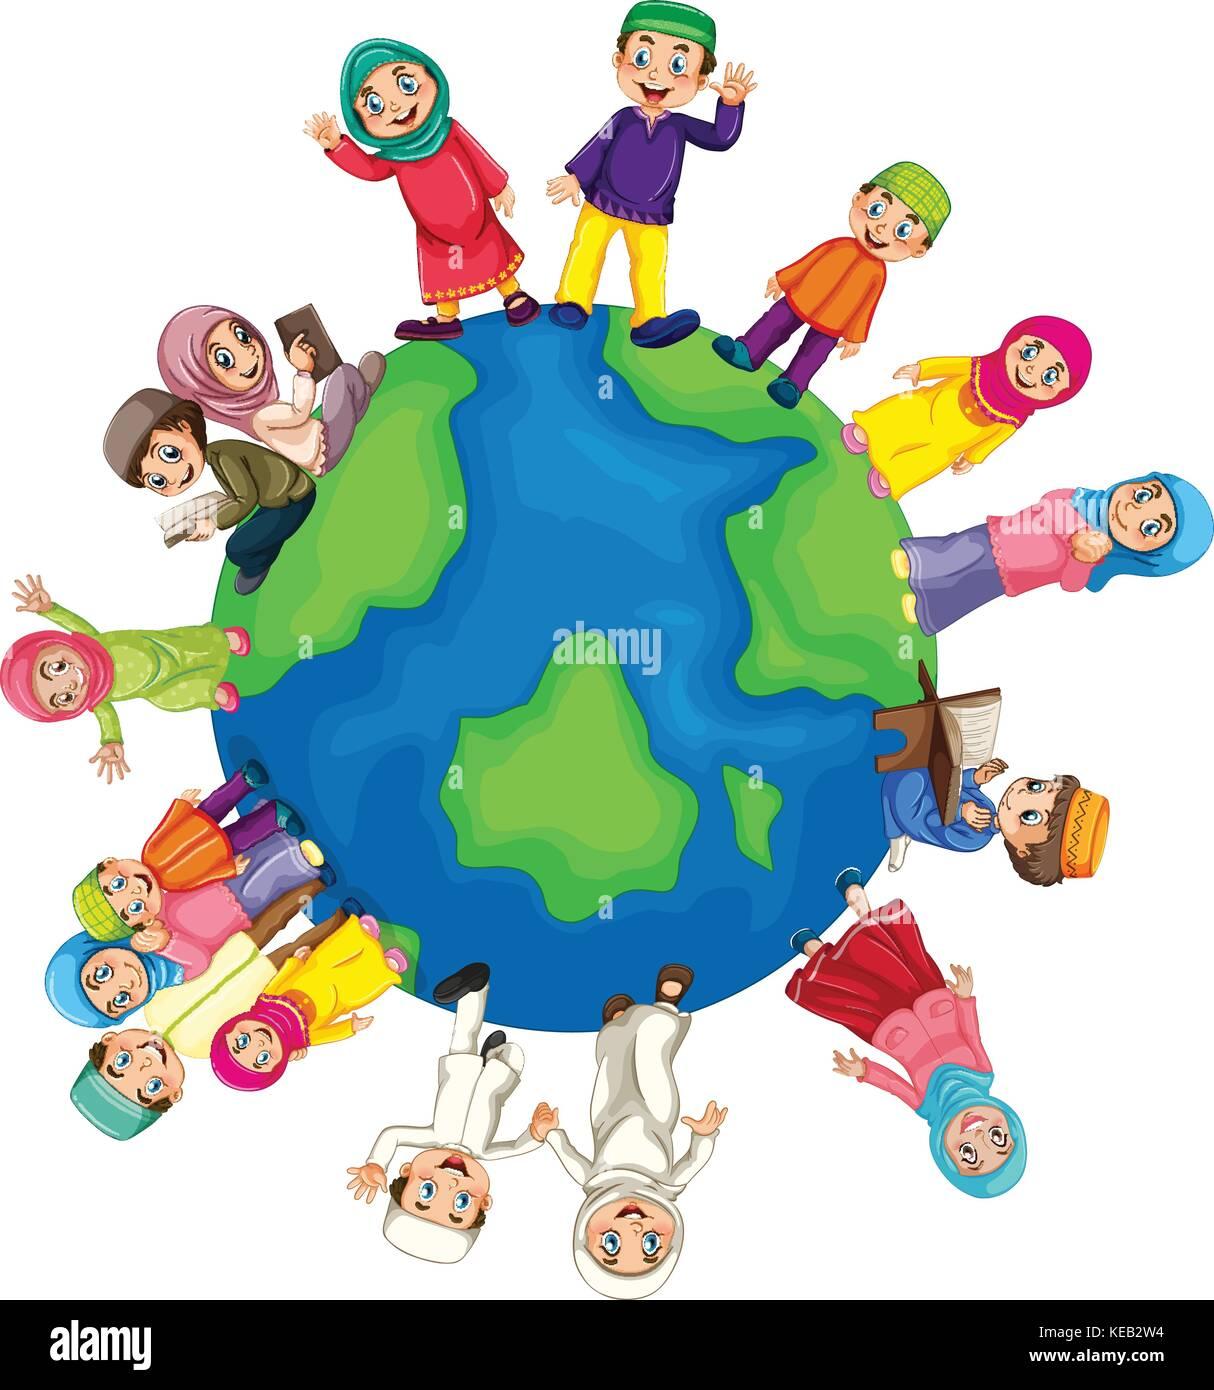 Many muslim around the world Stock Vector Image & Art   Alamy